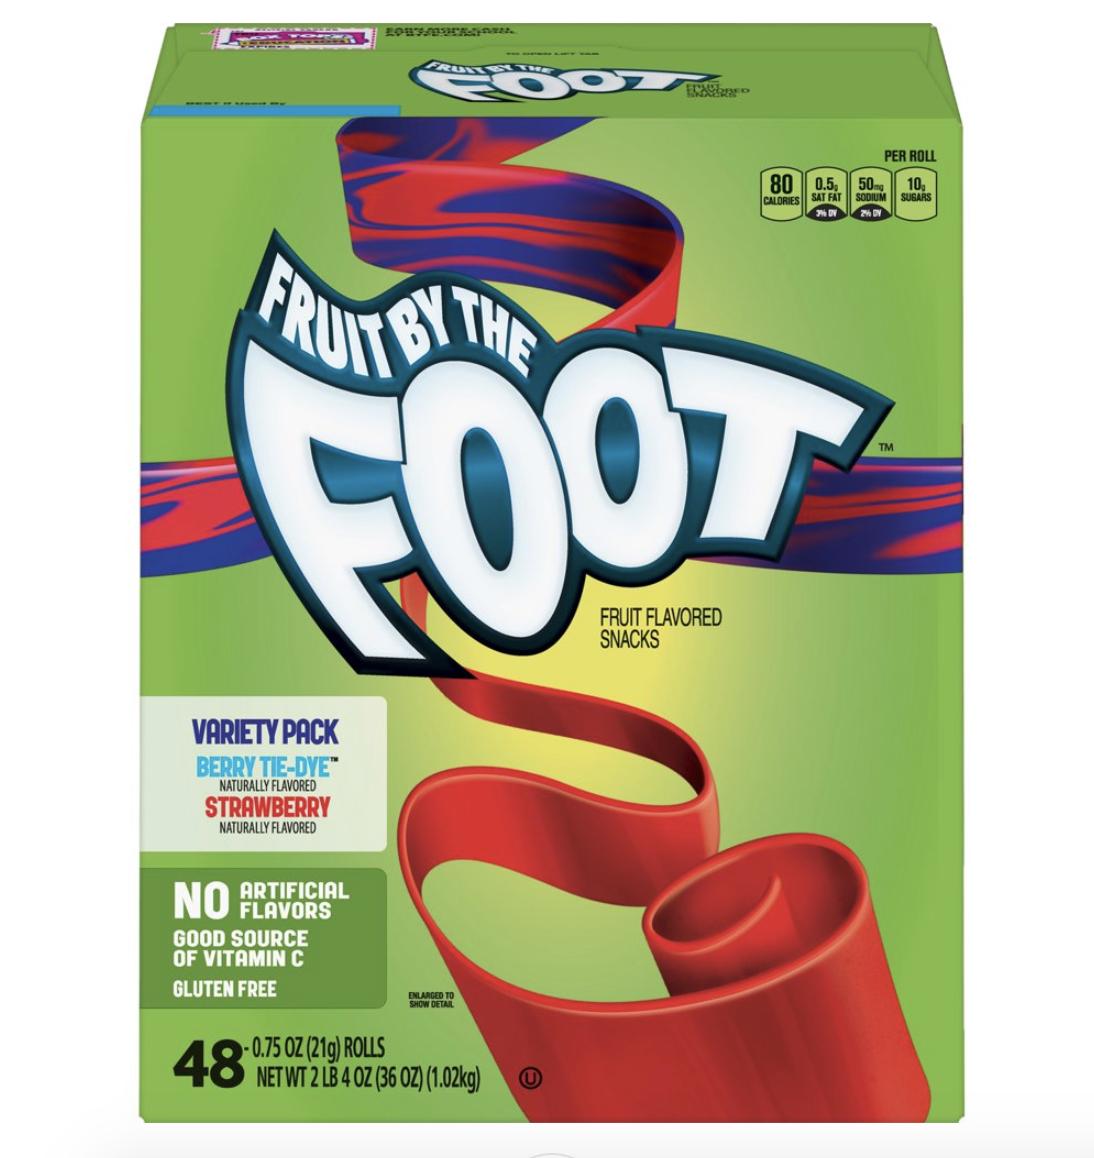 box of Fruit Roll-Ups